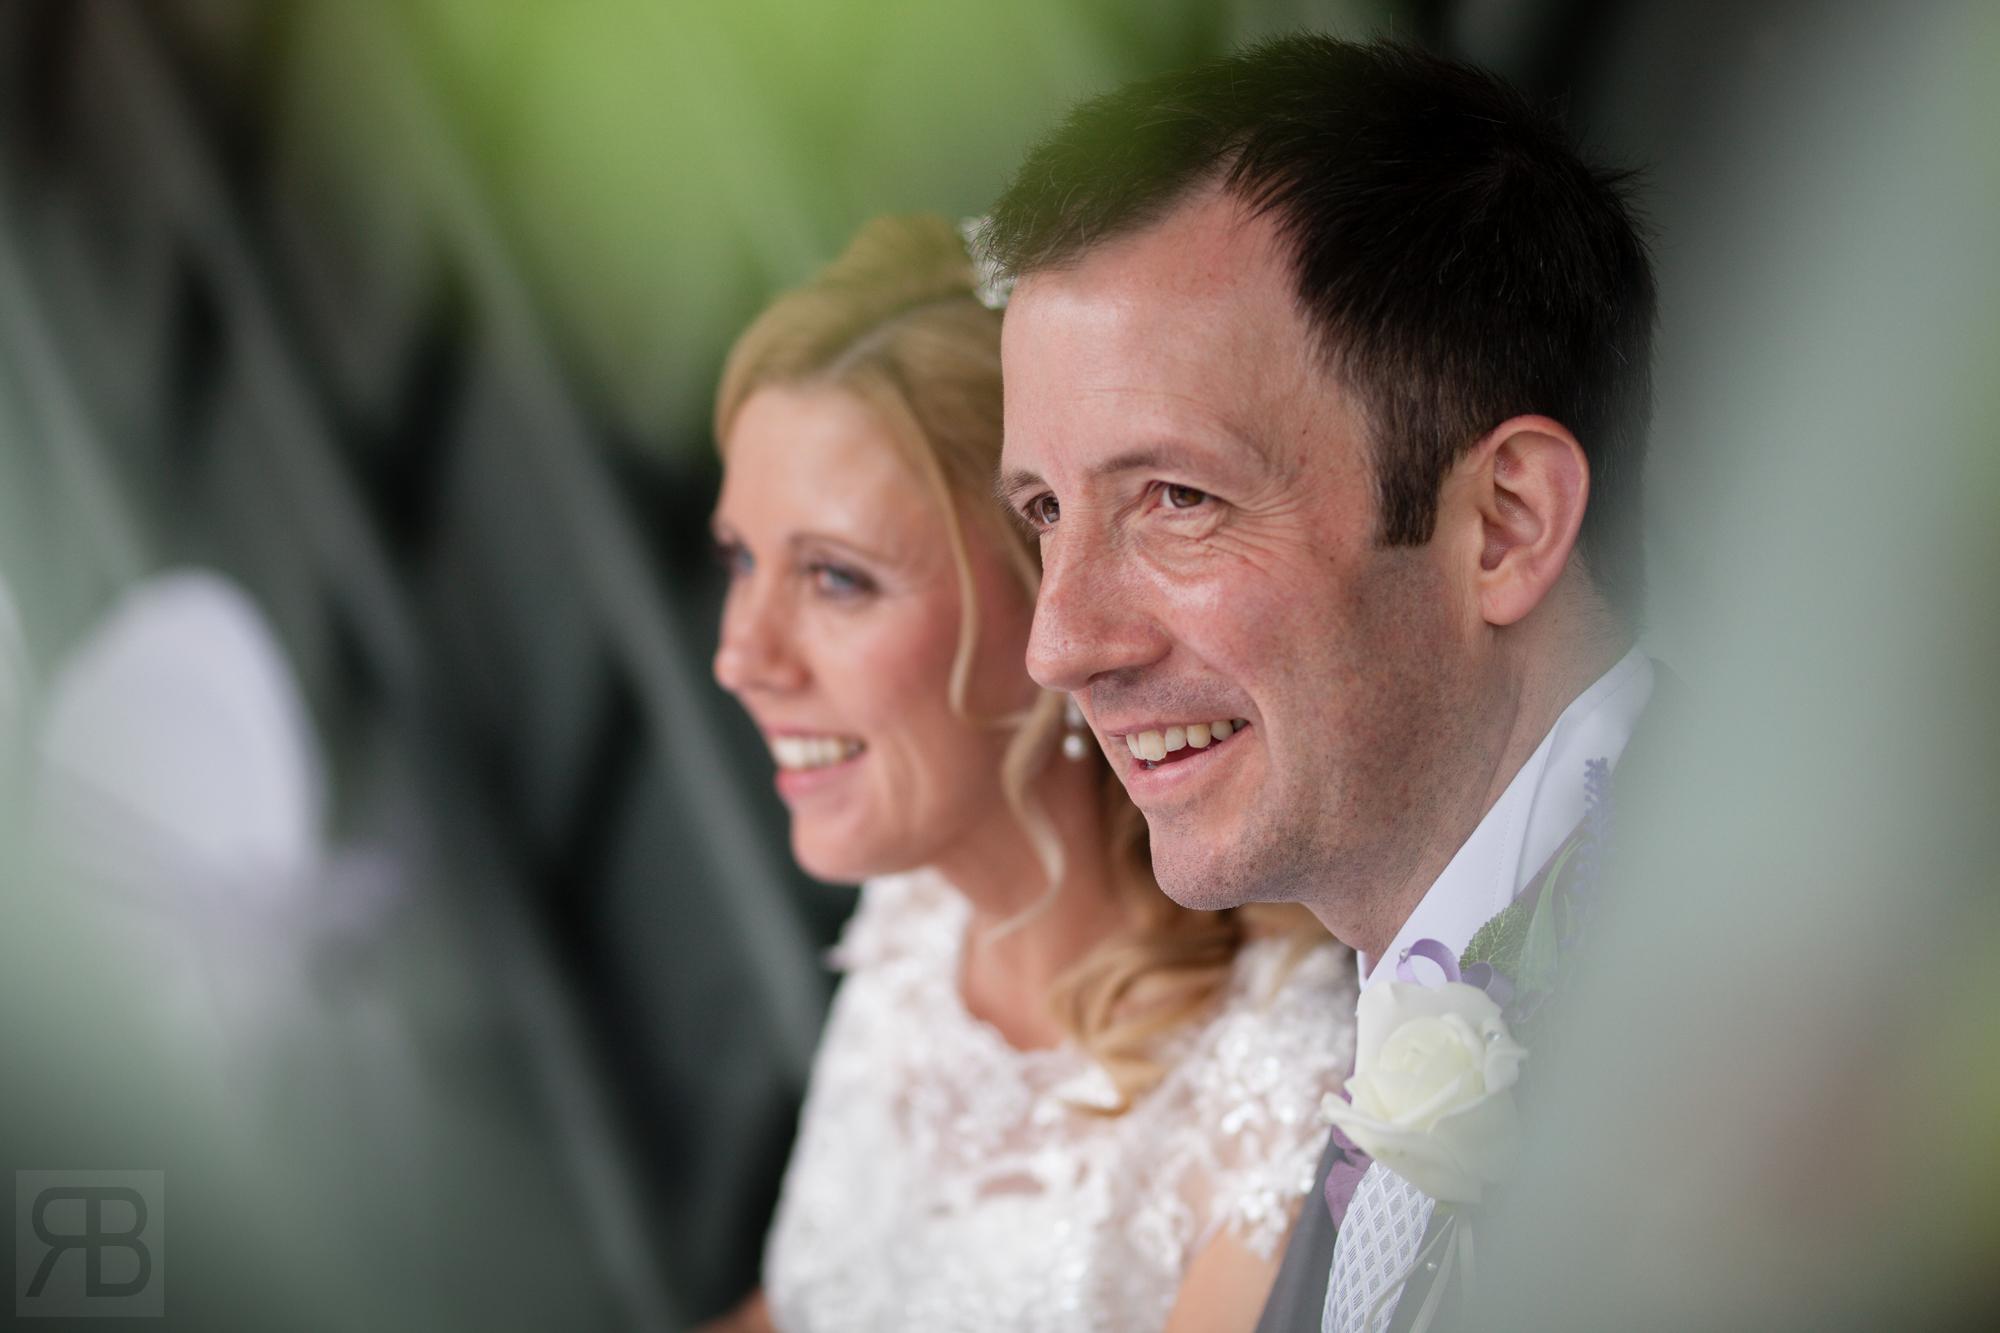 110715_LisaCraigJohnson_Wedding_5730322_WebWM.jpg